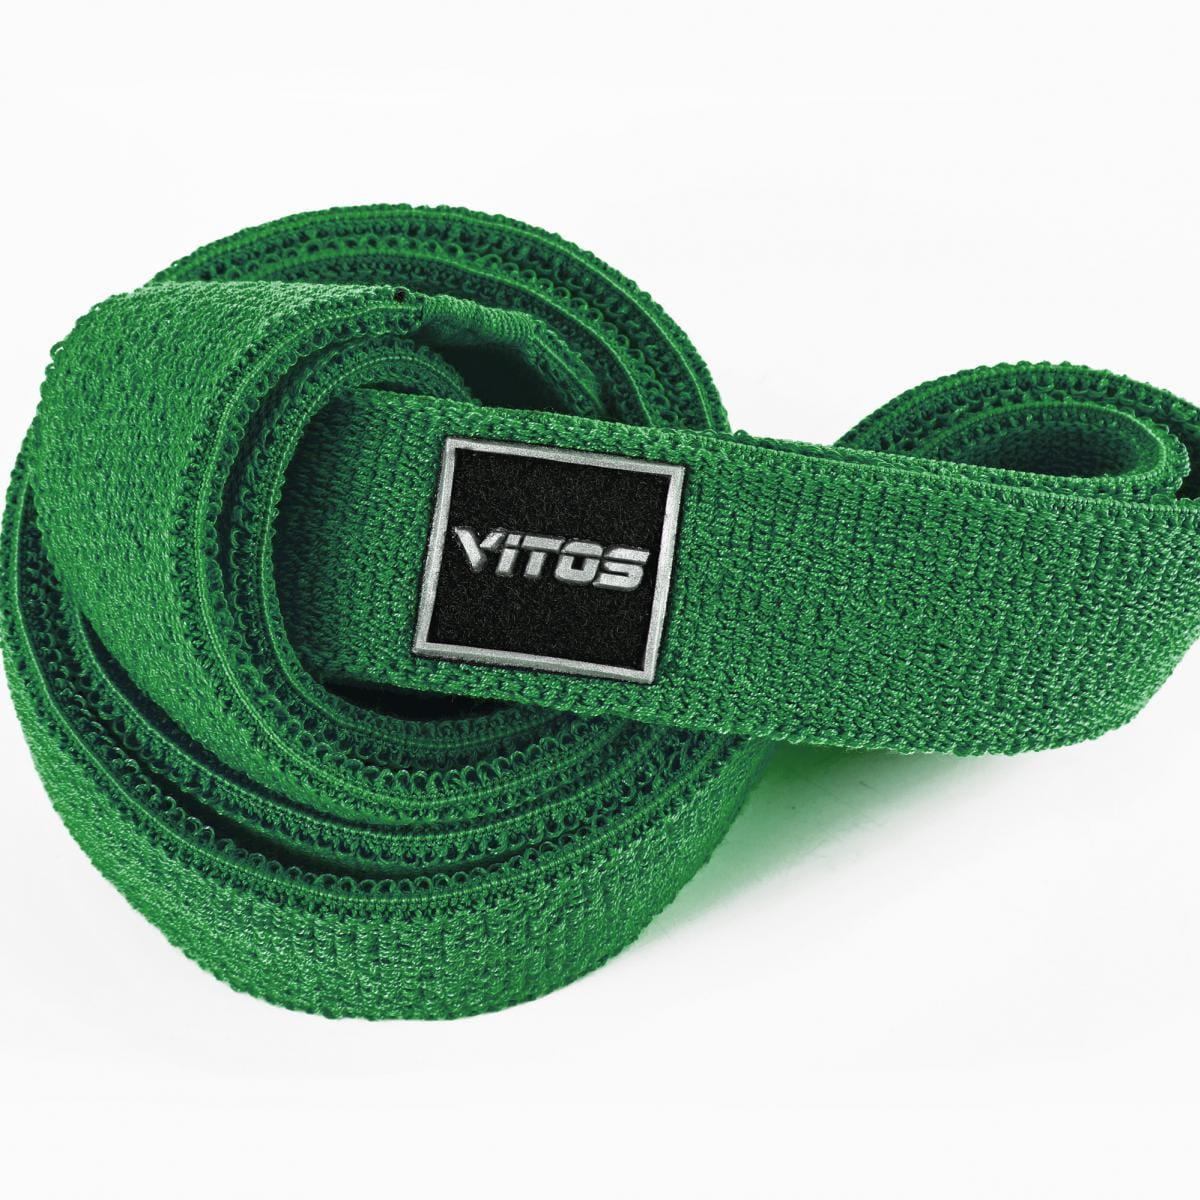 VITOS VPOWER阻力帶 HEAVY綠 6